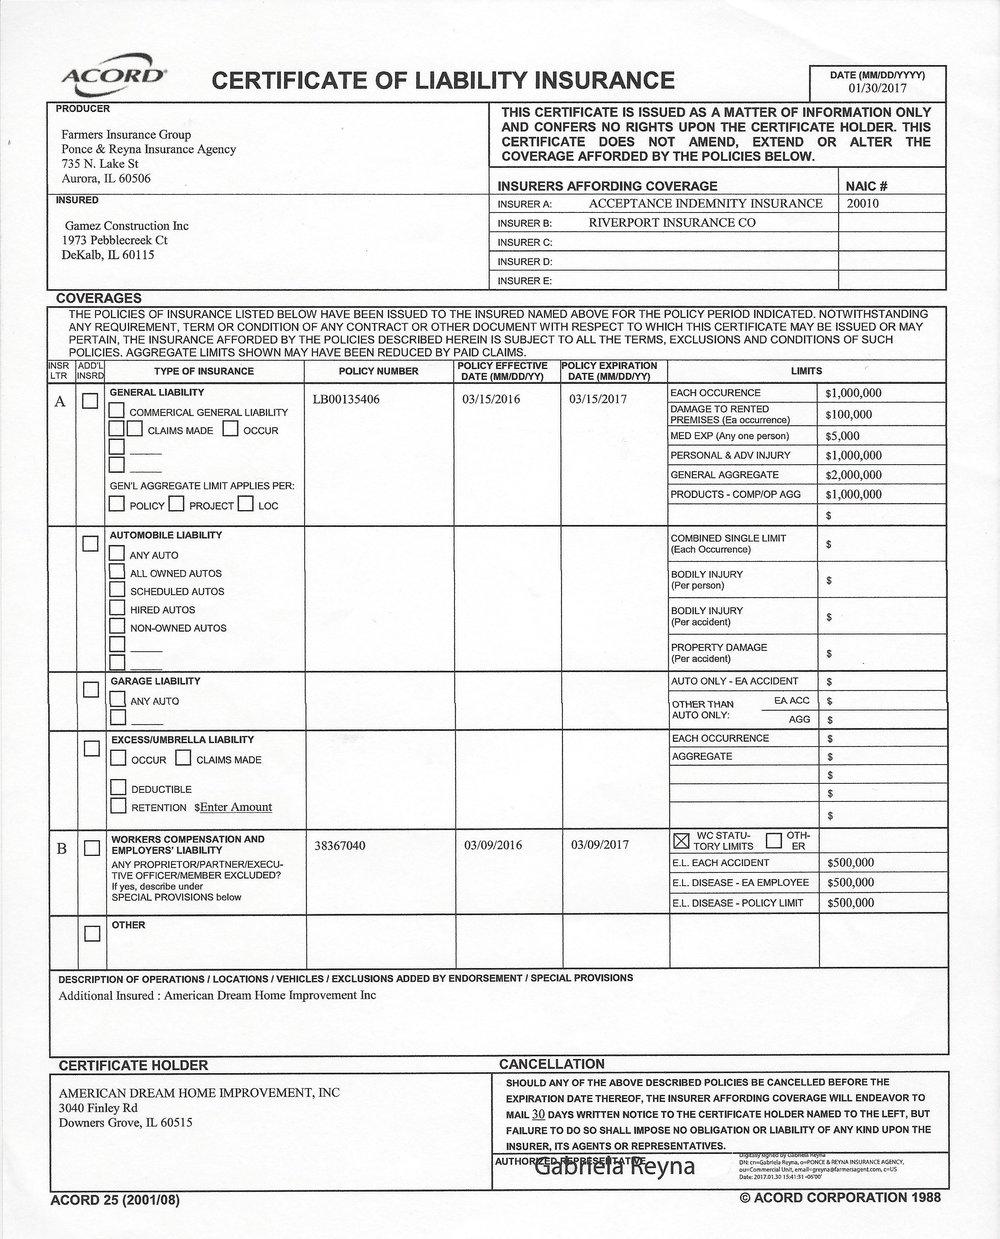 Insurance Certificate.jpg